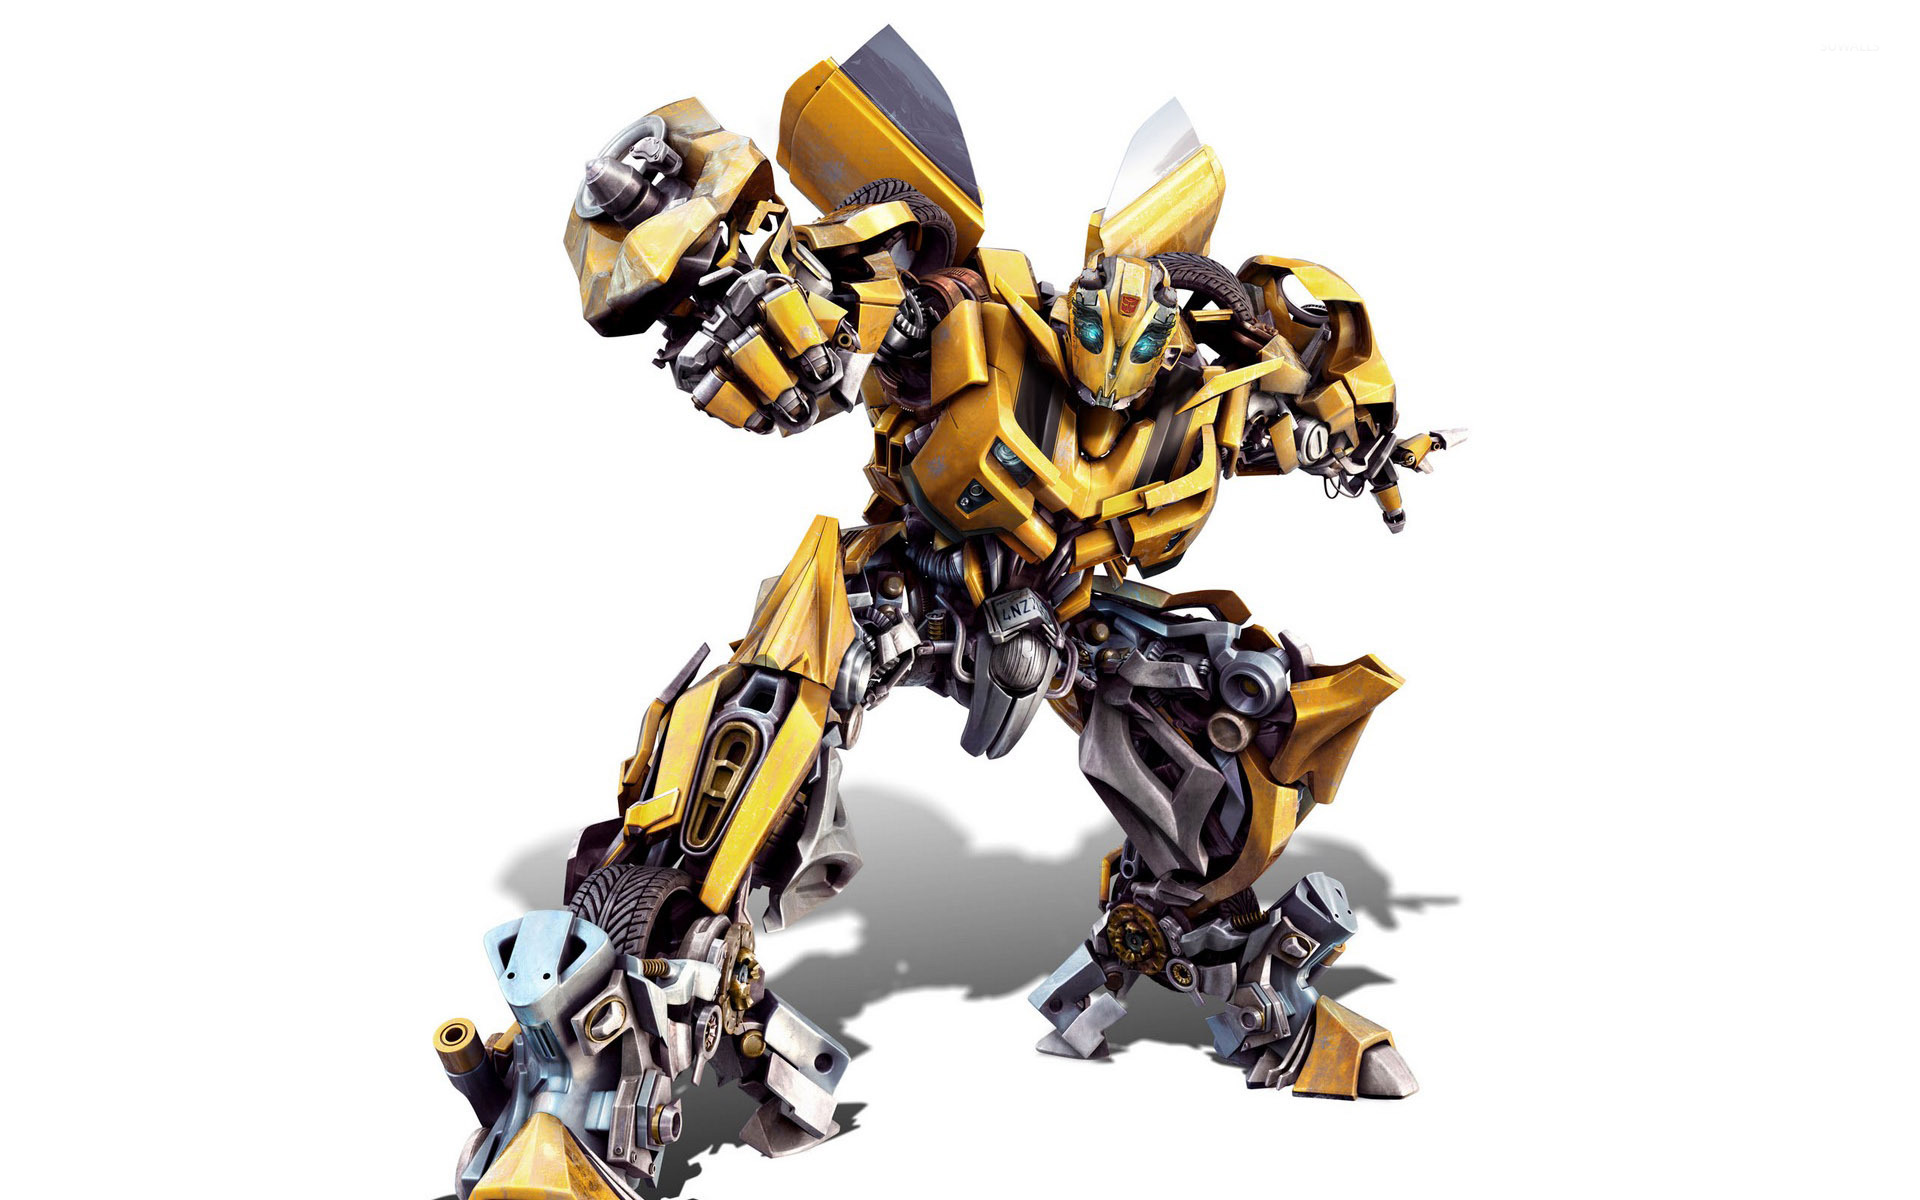 bumblebee transformers 8 wallpaper movie wallpapers 34427. Black Bedroom Furniture Sets. Home Design Ideas